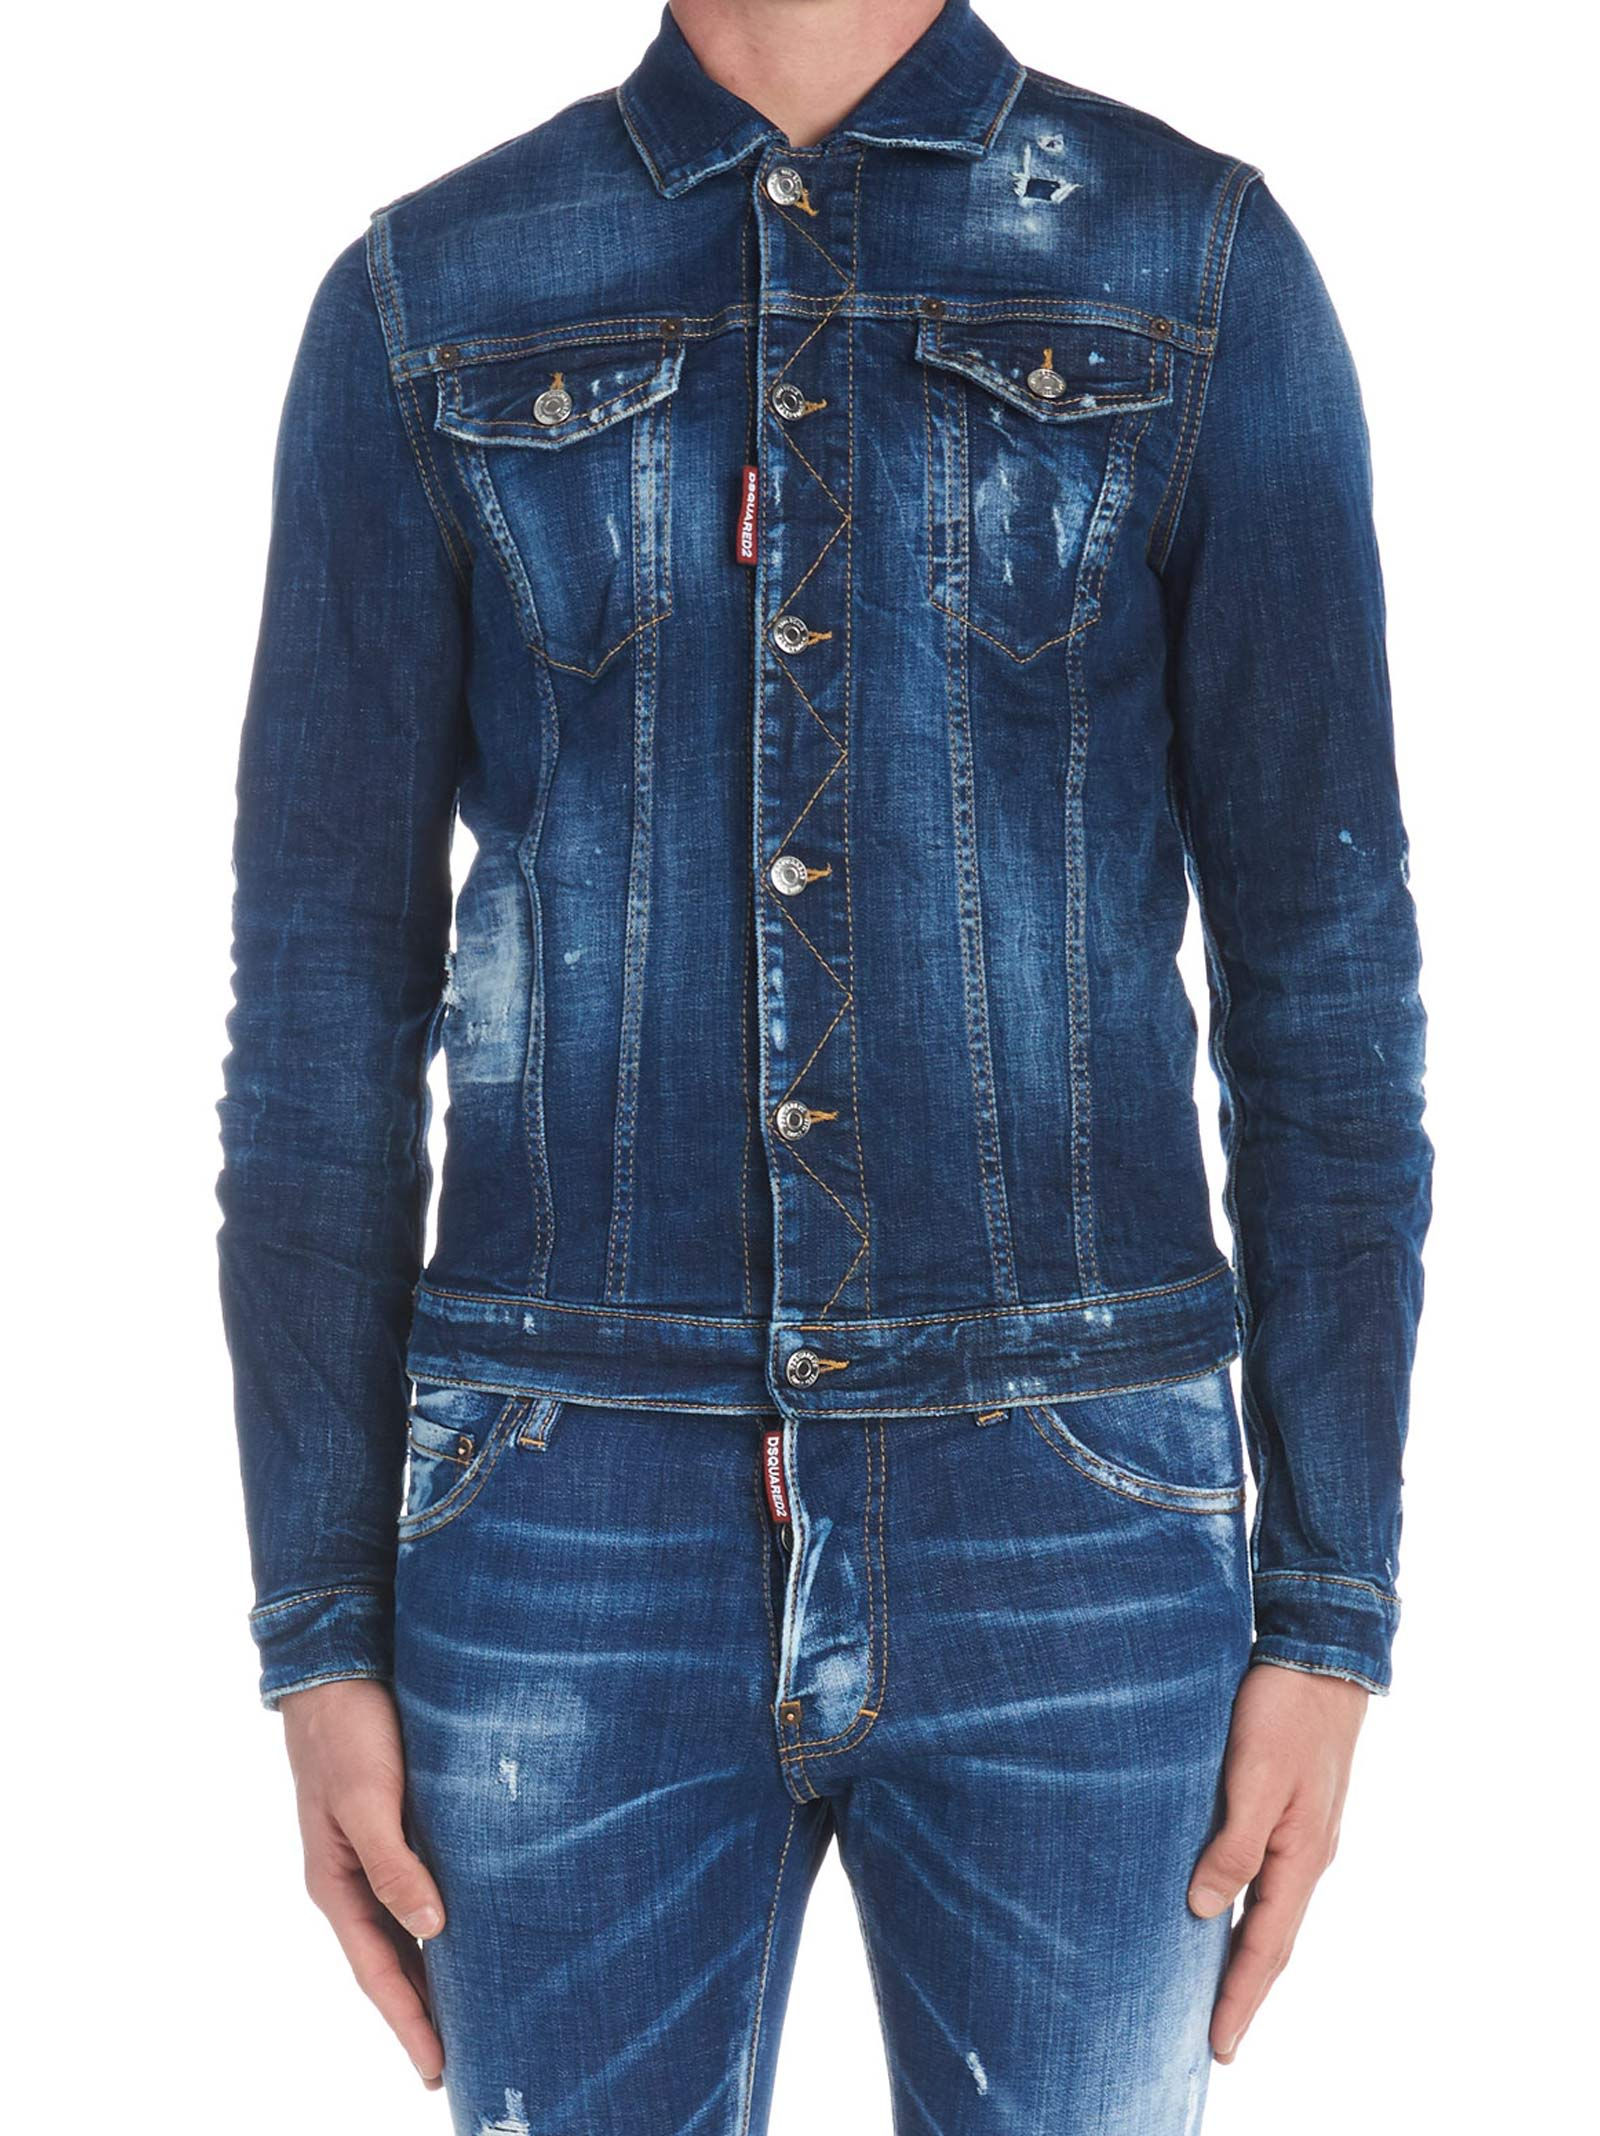 Dsquared2 'classic Jean' Jacket